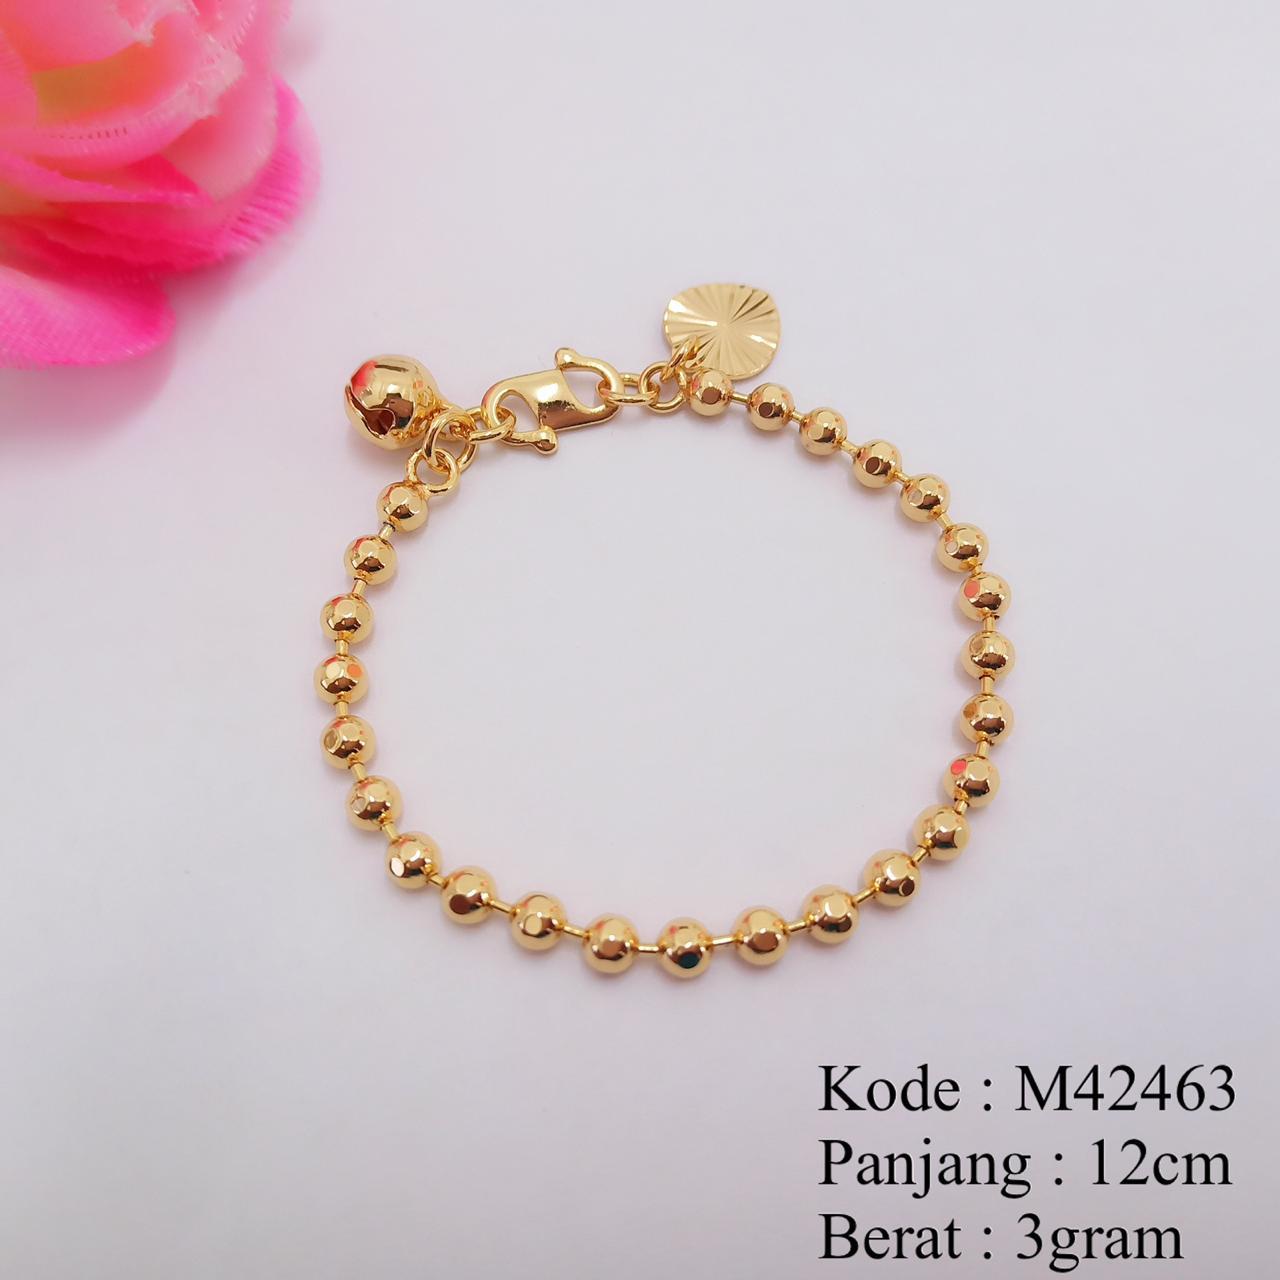 [BAYAR DITEMPAT]Gelang Tangan Anak Bayi Rantai Lapis Emas Missi Fashion Jewelry